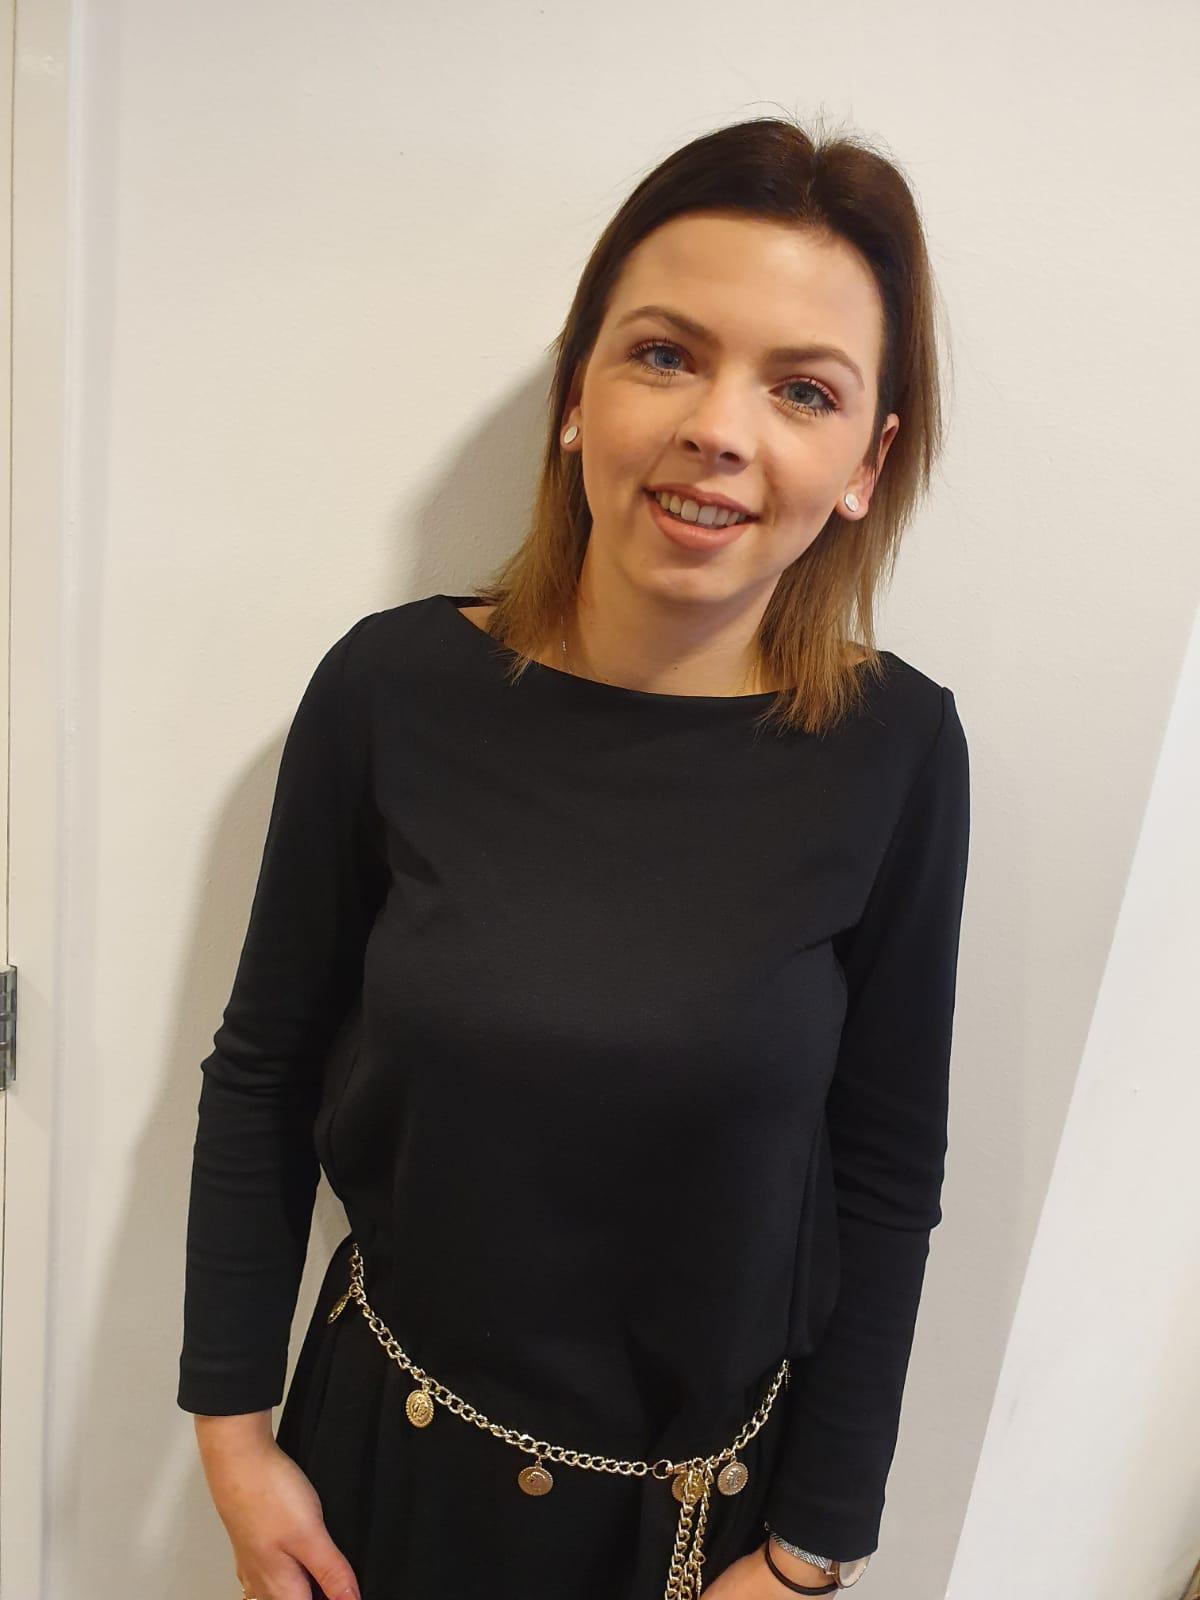 Shania - Kapper bij Inekes Hairstyling Geervliet